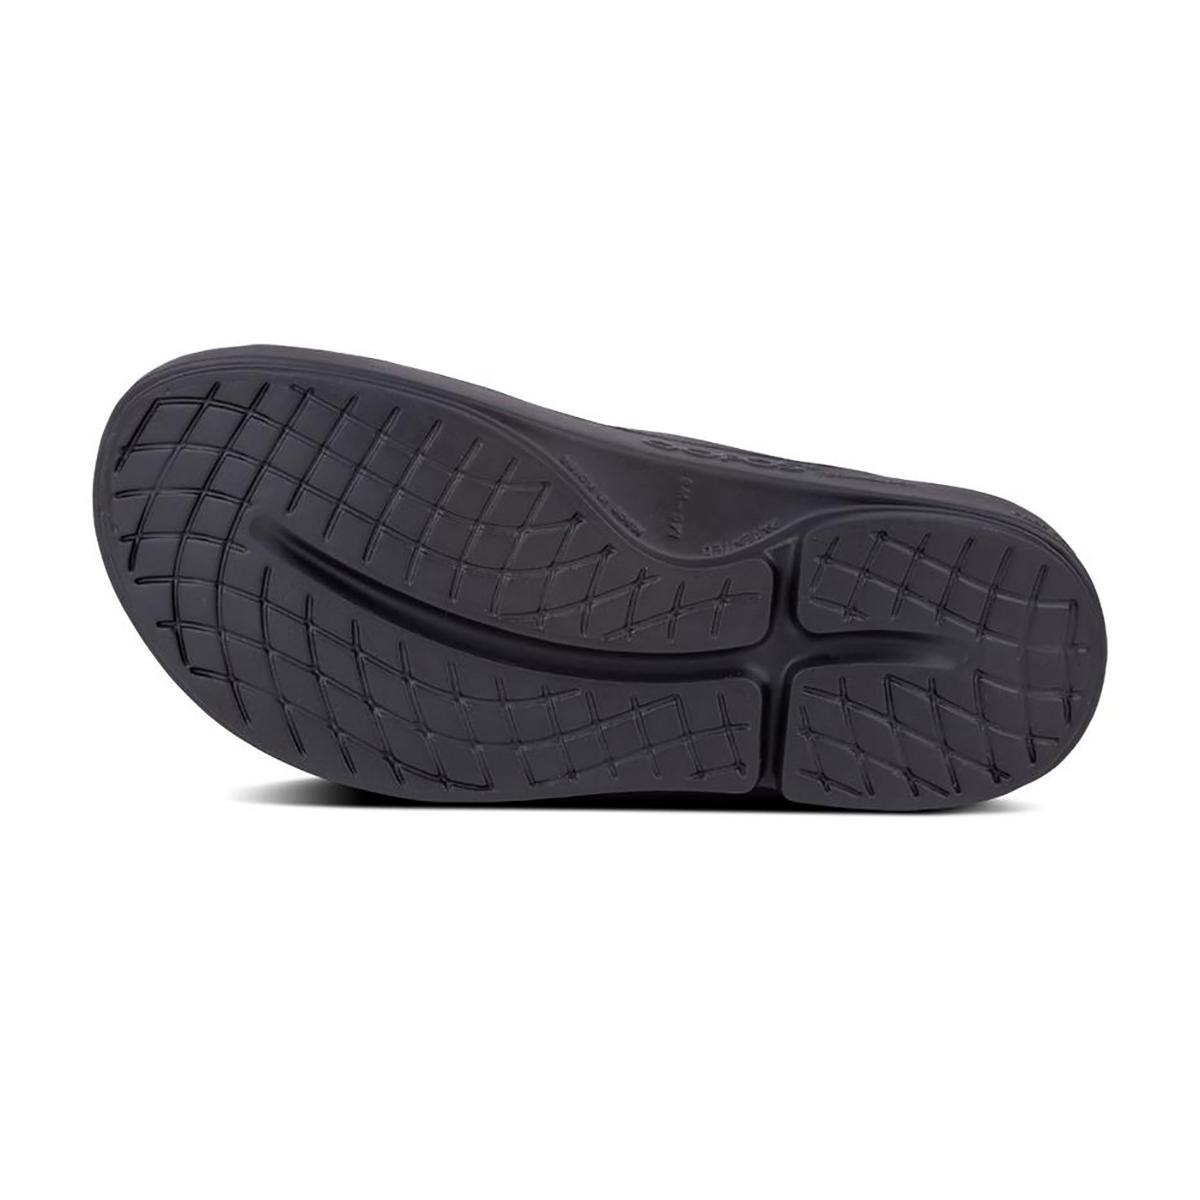 Oofos OOahh Recovery Slide - Color: Black - Size: M7/W9 - Width: Regular, Black, large, image 5